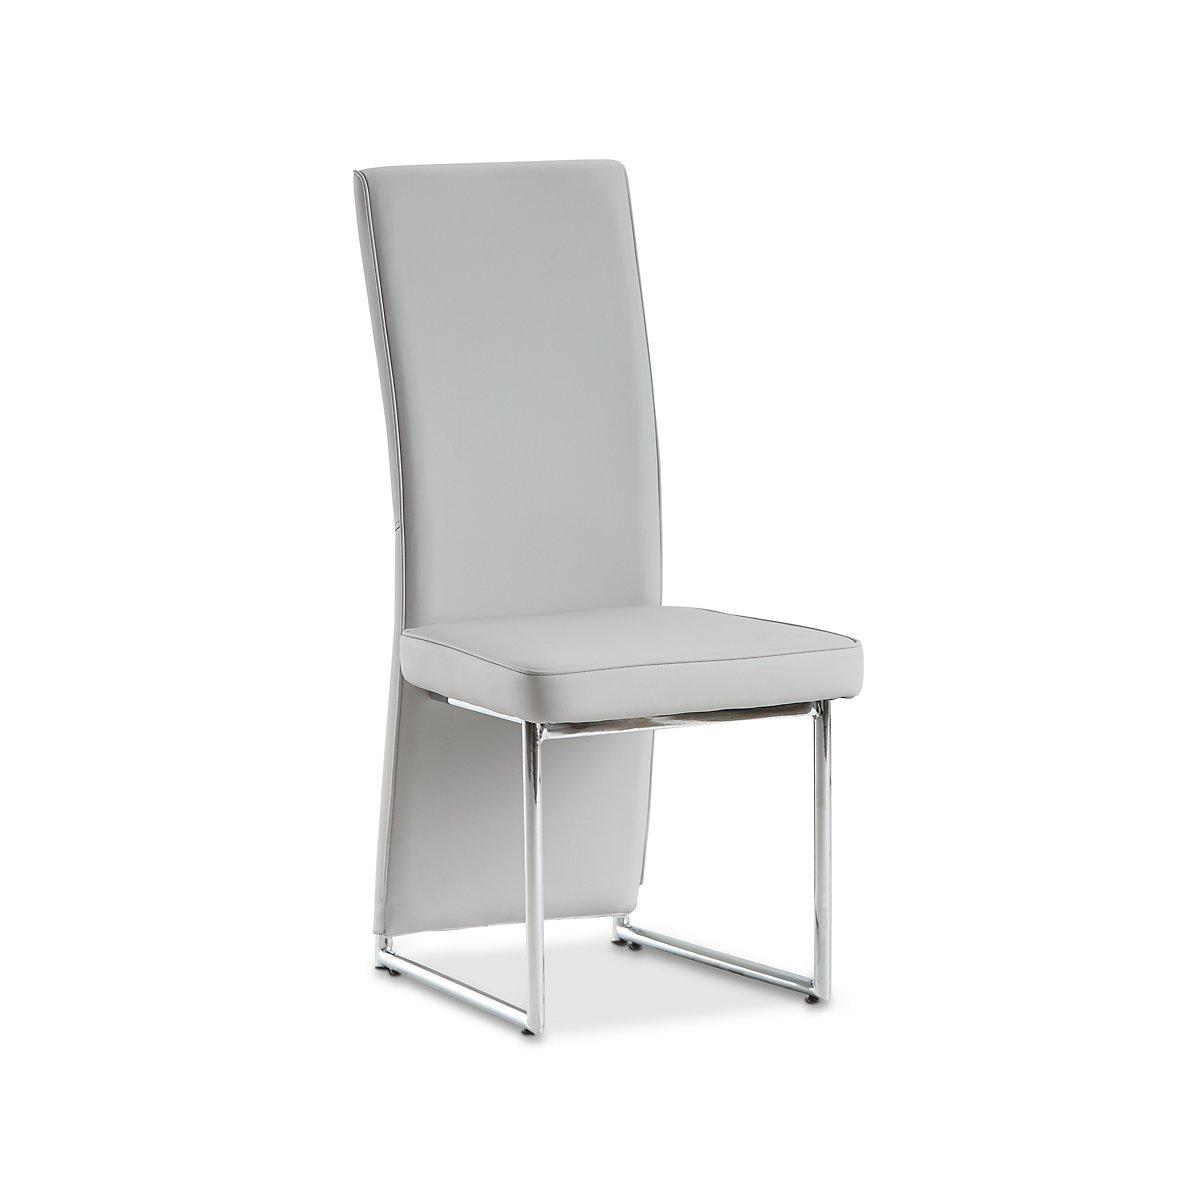 Paris Light Gray Upholstered Side Chair